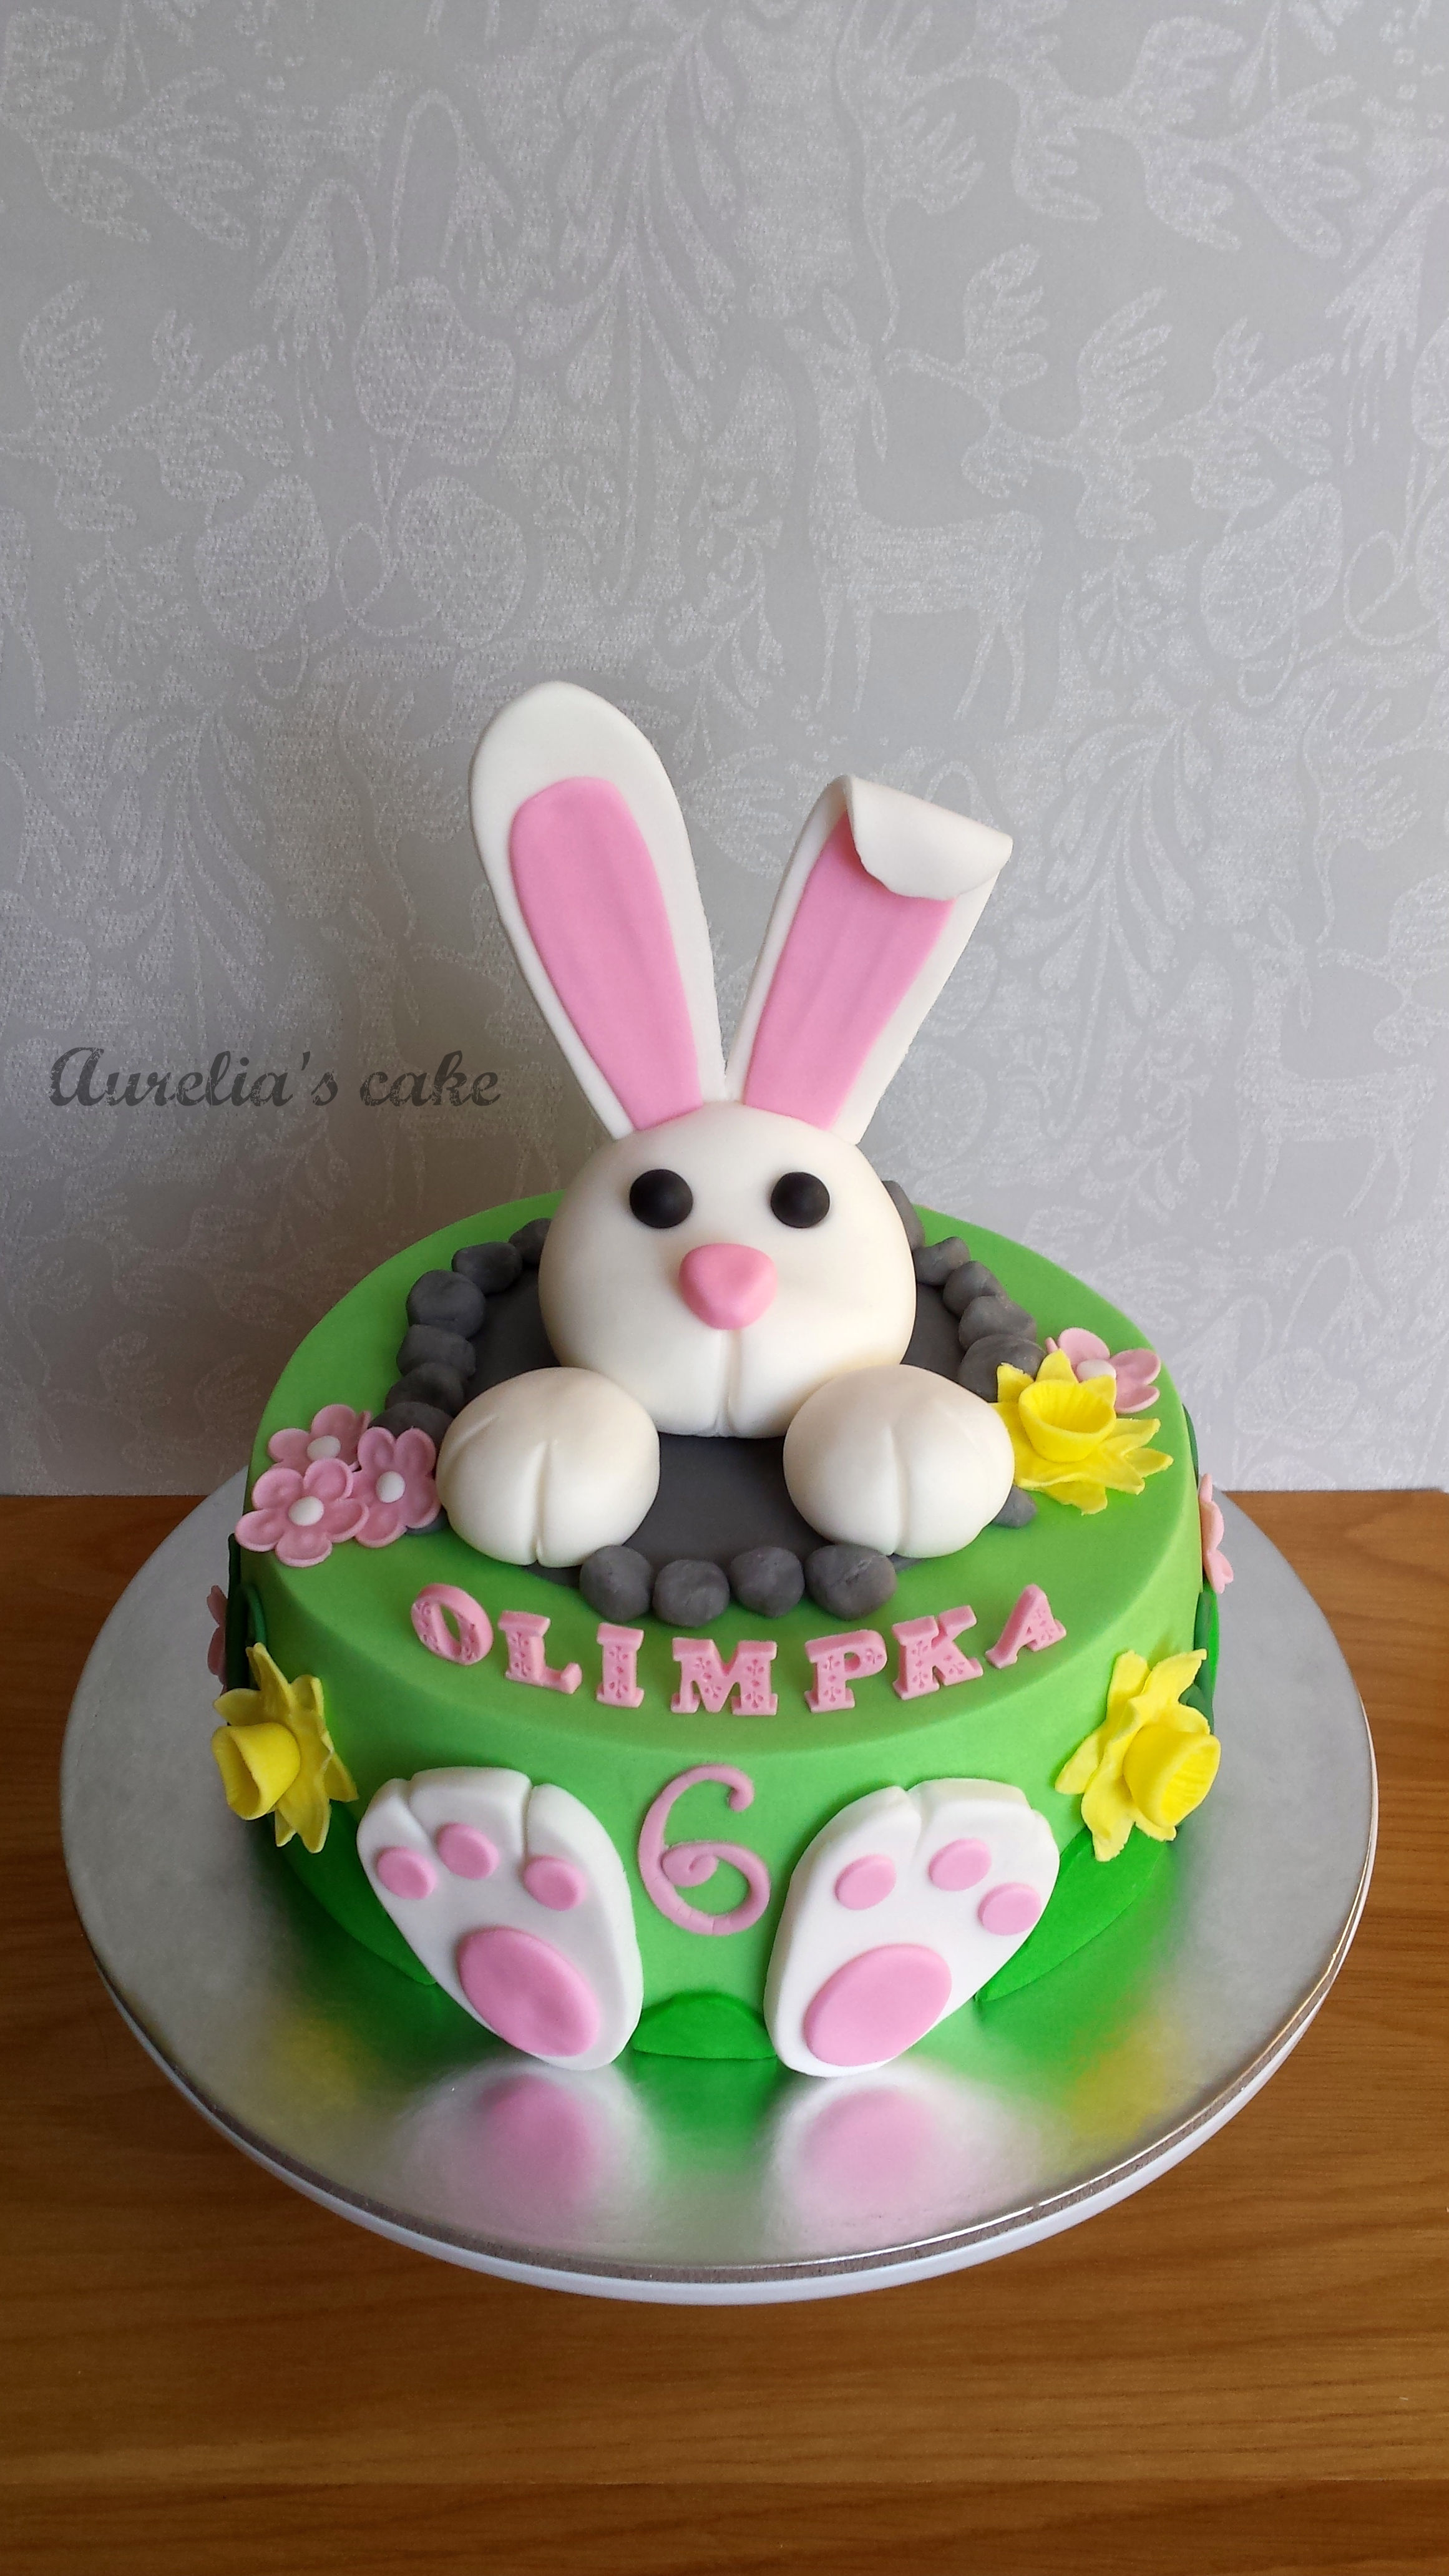 Bunny/easter cake.